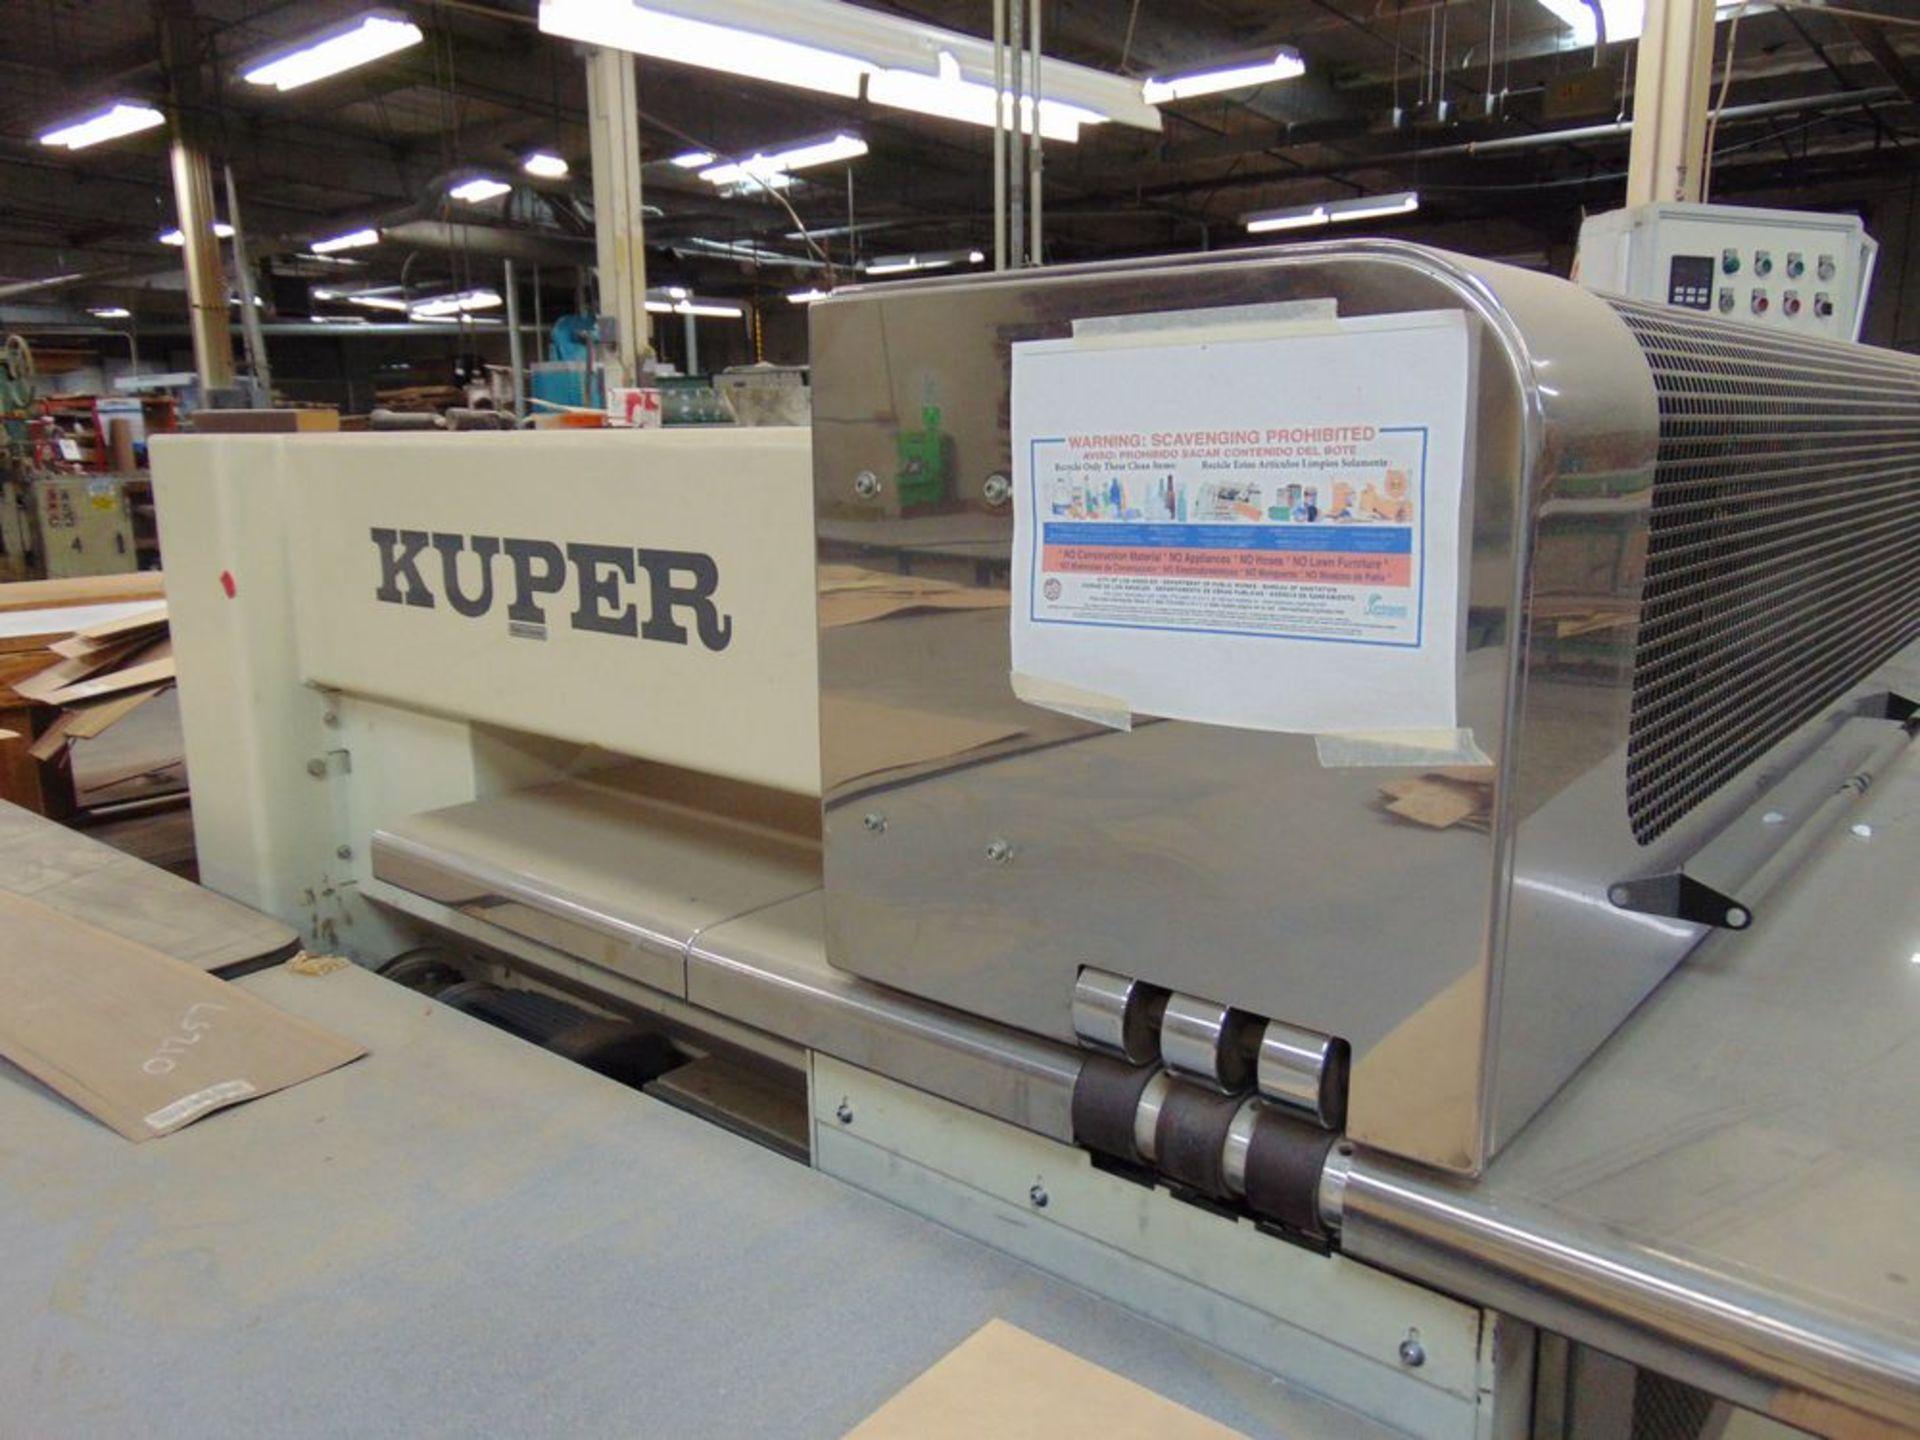 (1999) Kuper Type FCI Mach. No. 3908/0113 Veneer Splicing Machine w/ 54'' x 102''L Light Table; S/ - Image 5 of 7